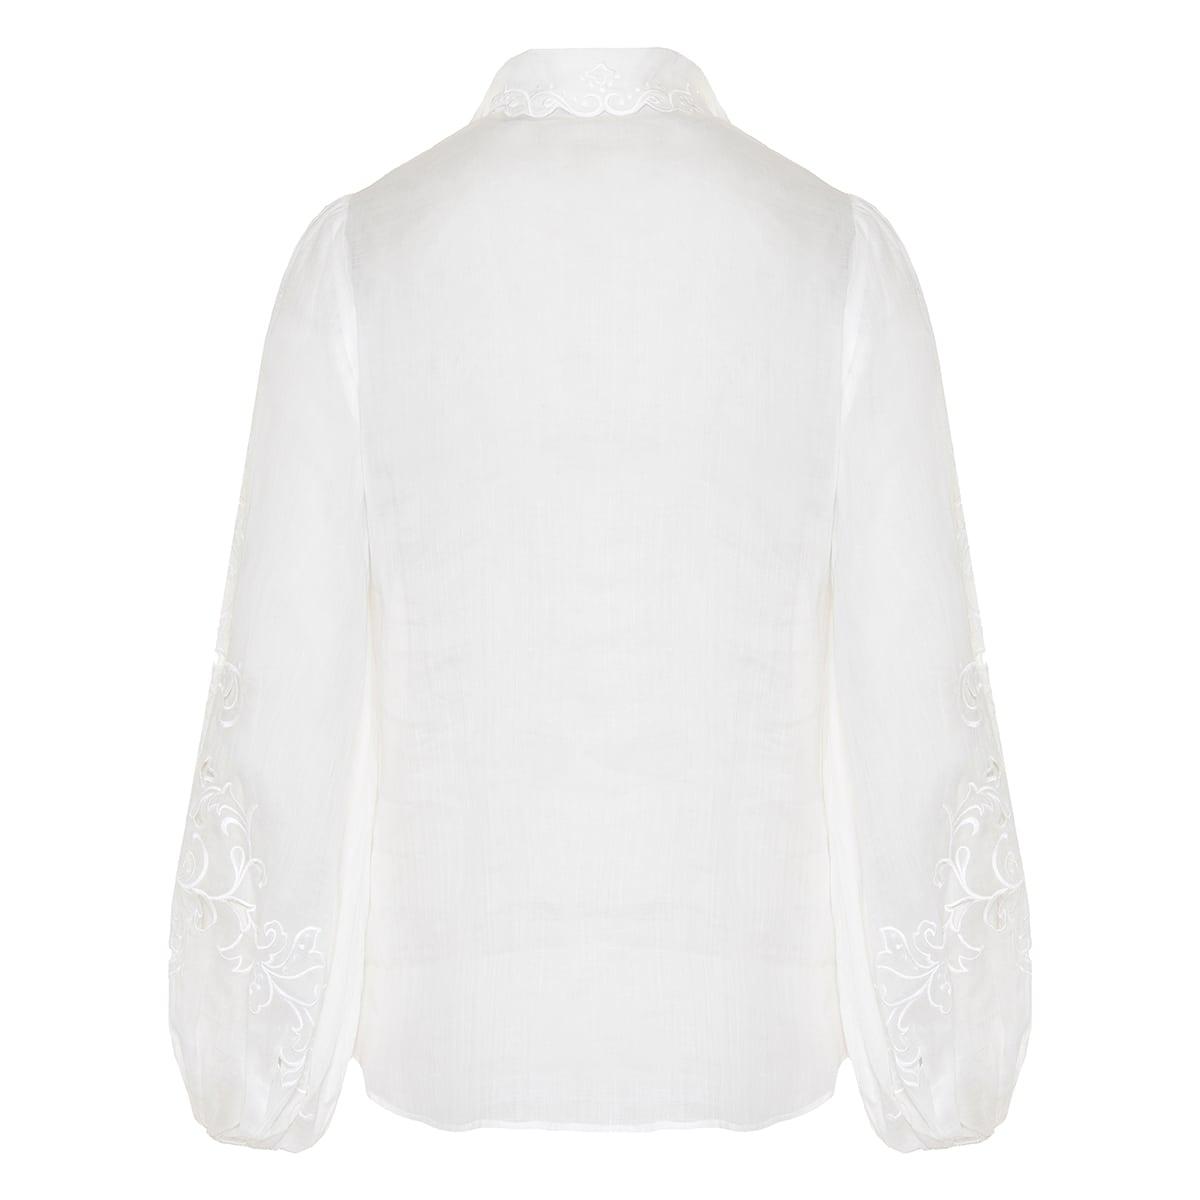 Nina broderie-anglaise ramie shirt